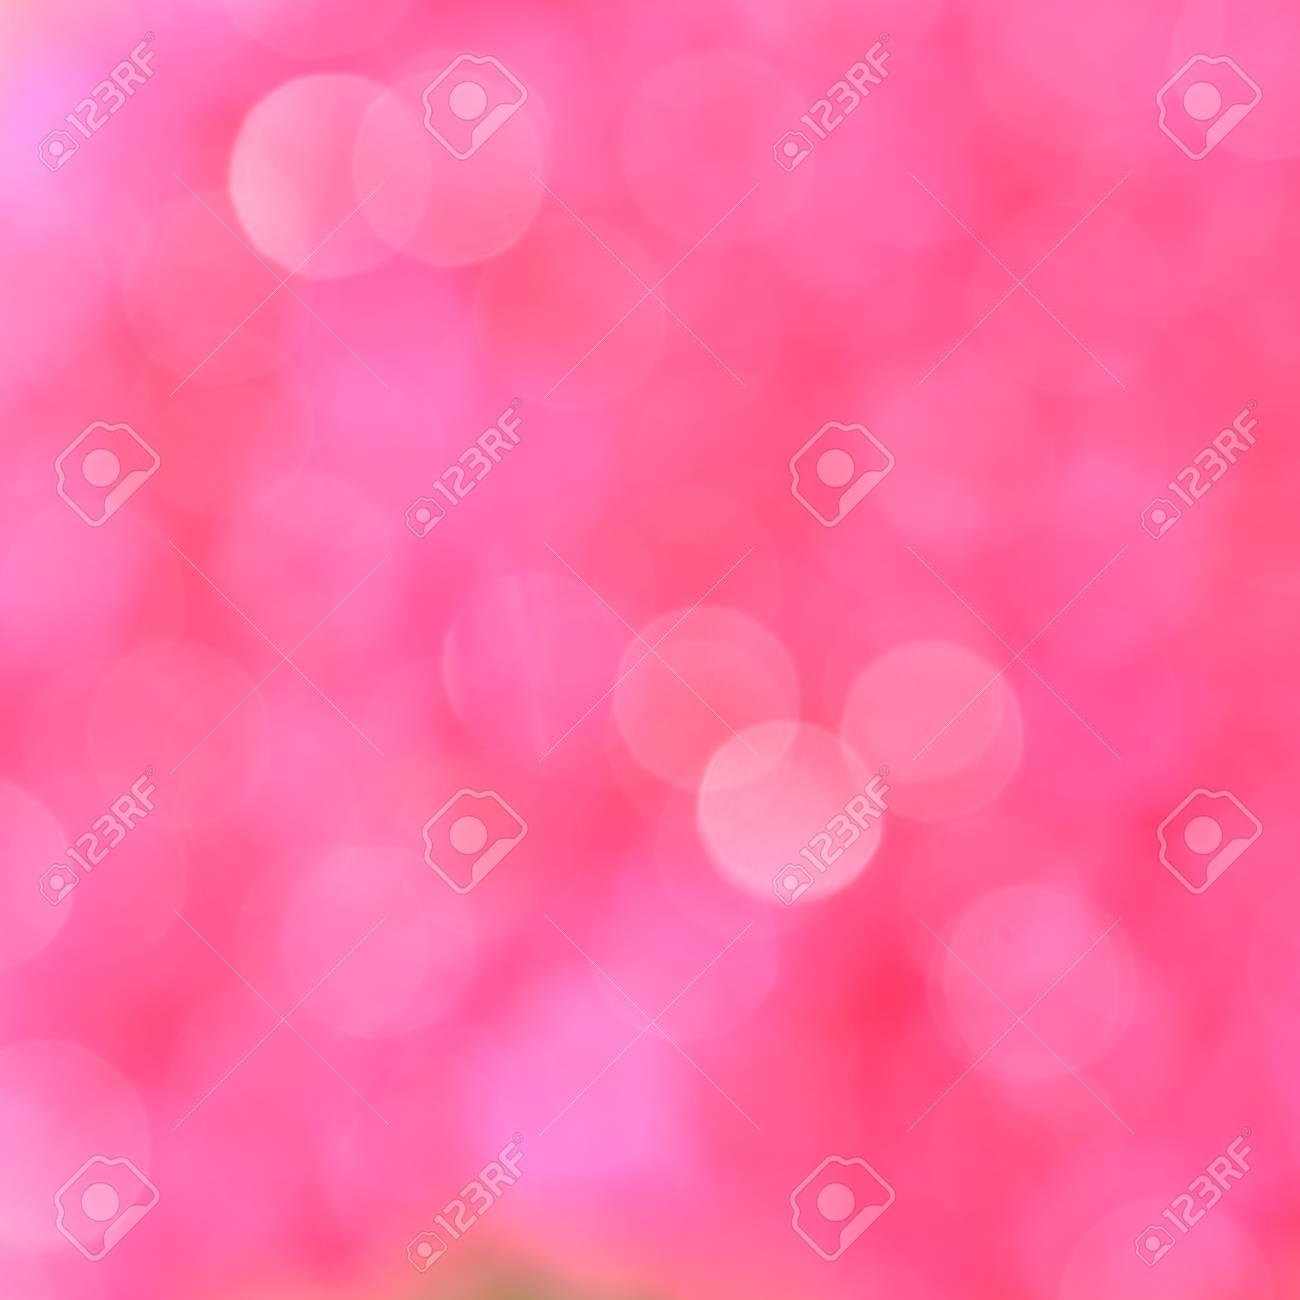 Pink background with bokeh defocused lights - 53243012